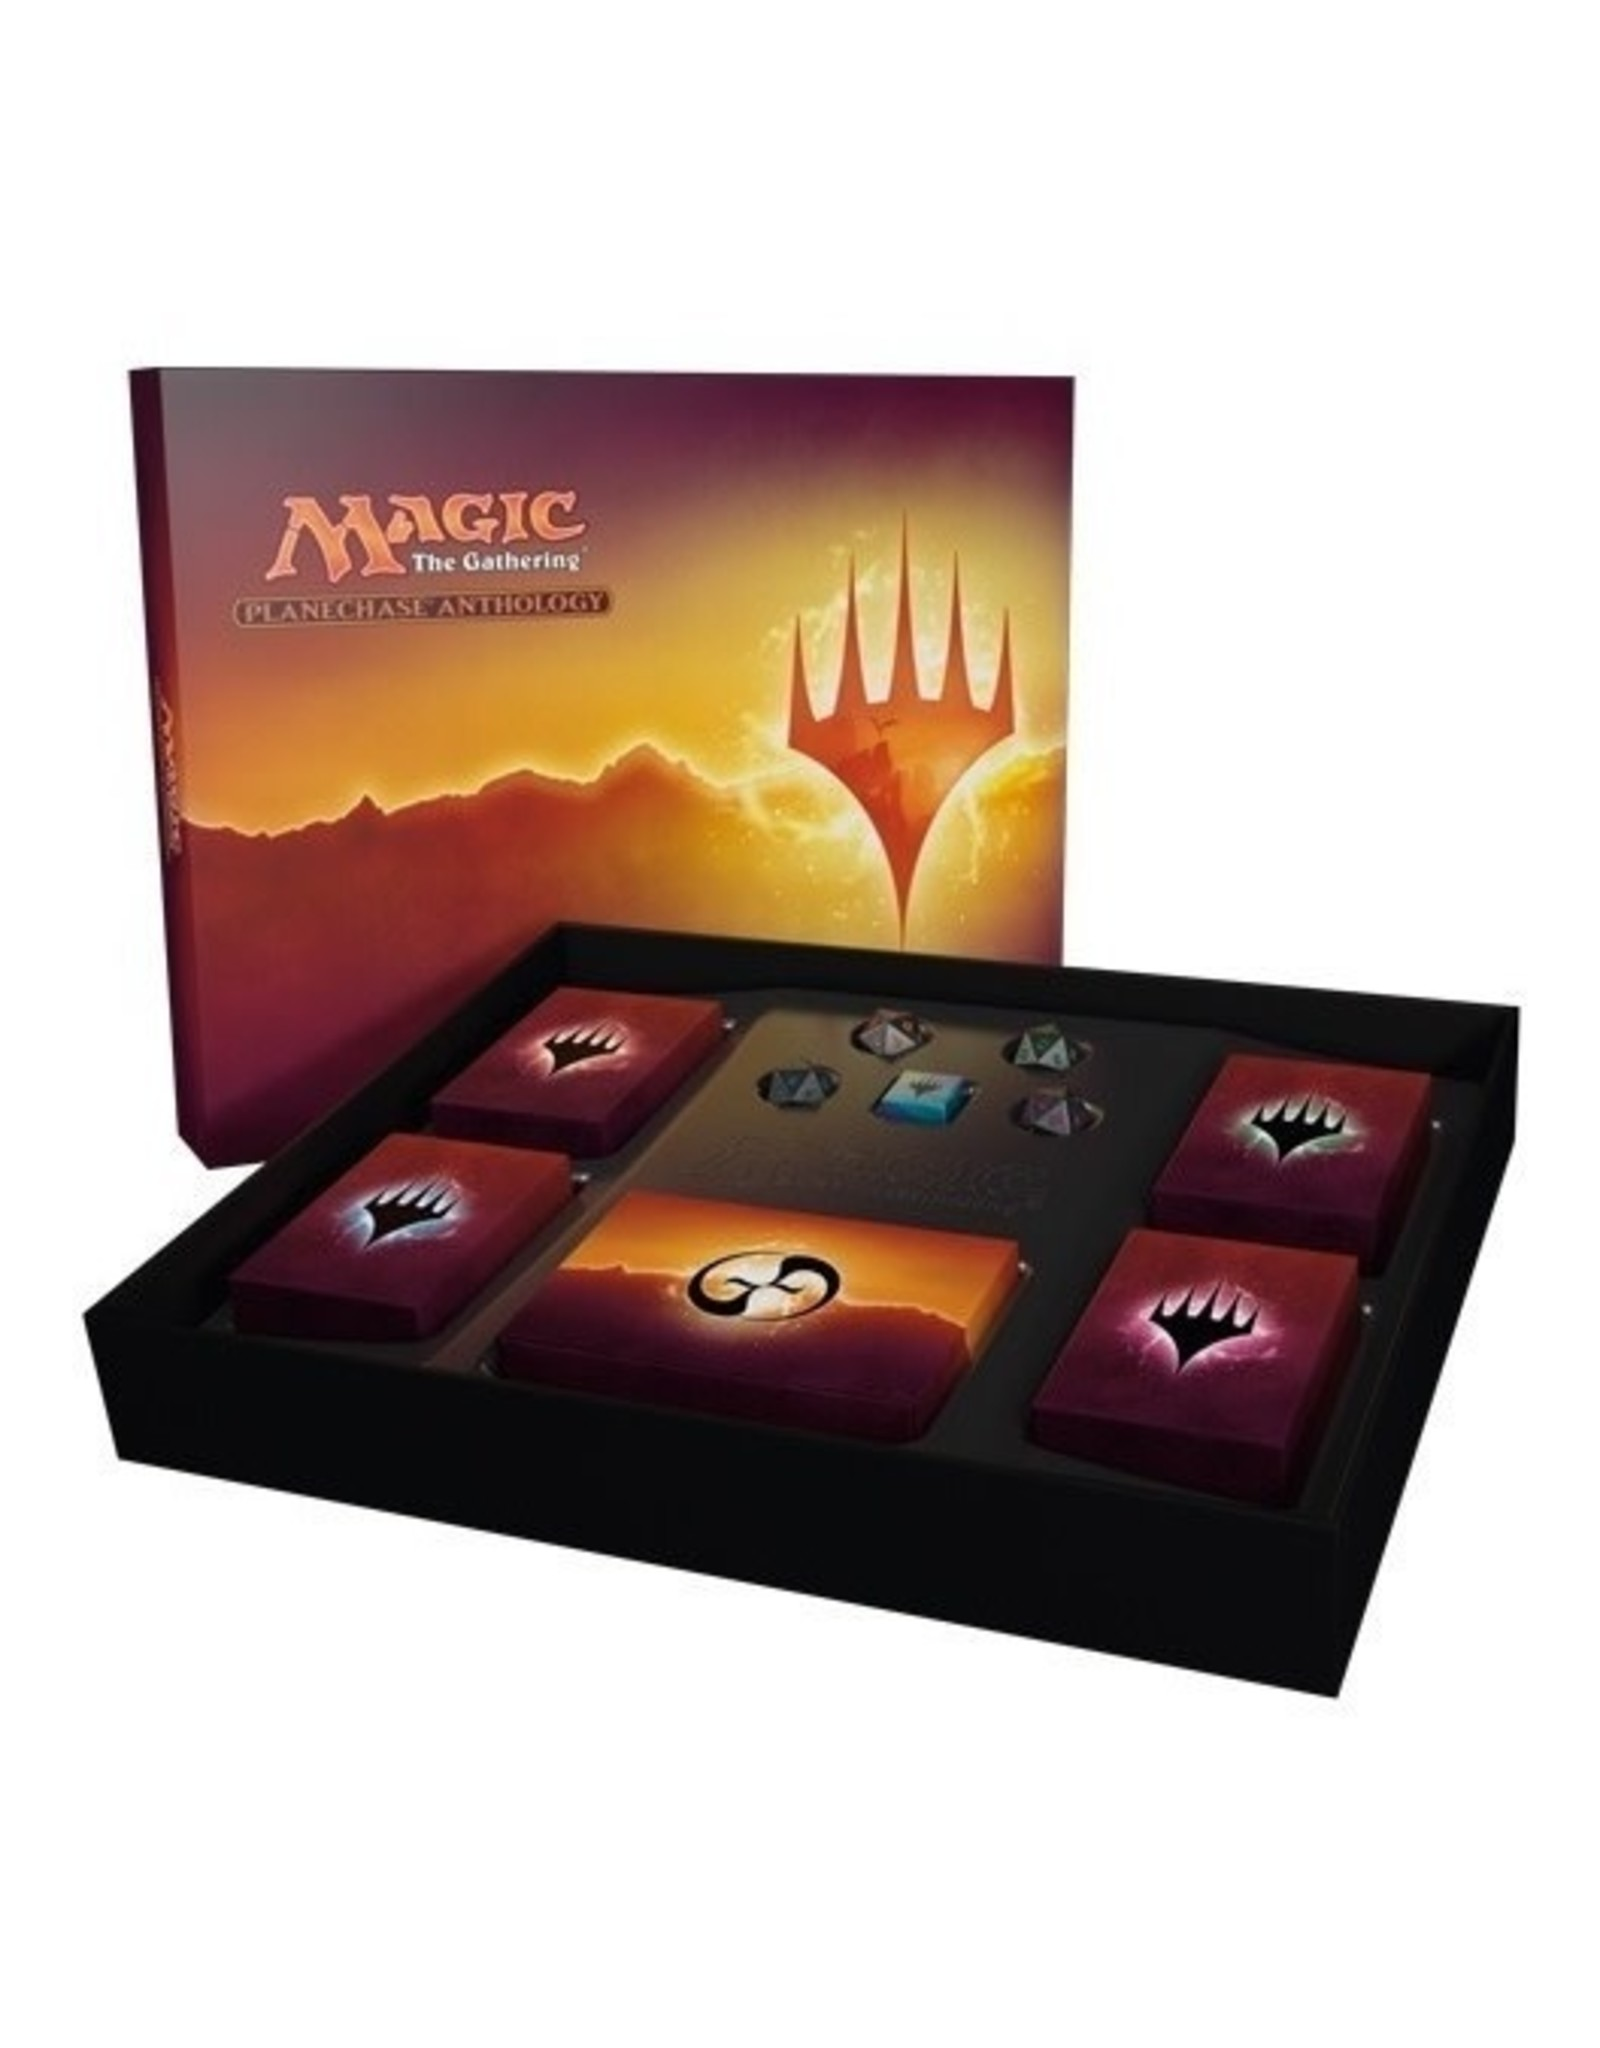 Wizards of the Coast Magic the Gathering CCG: Planechase Anthology